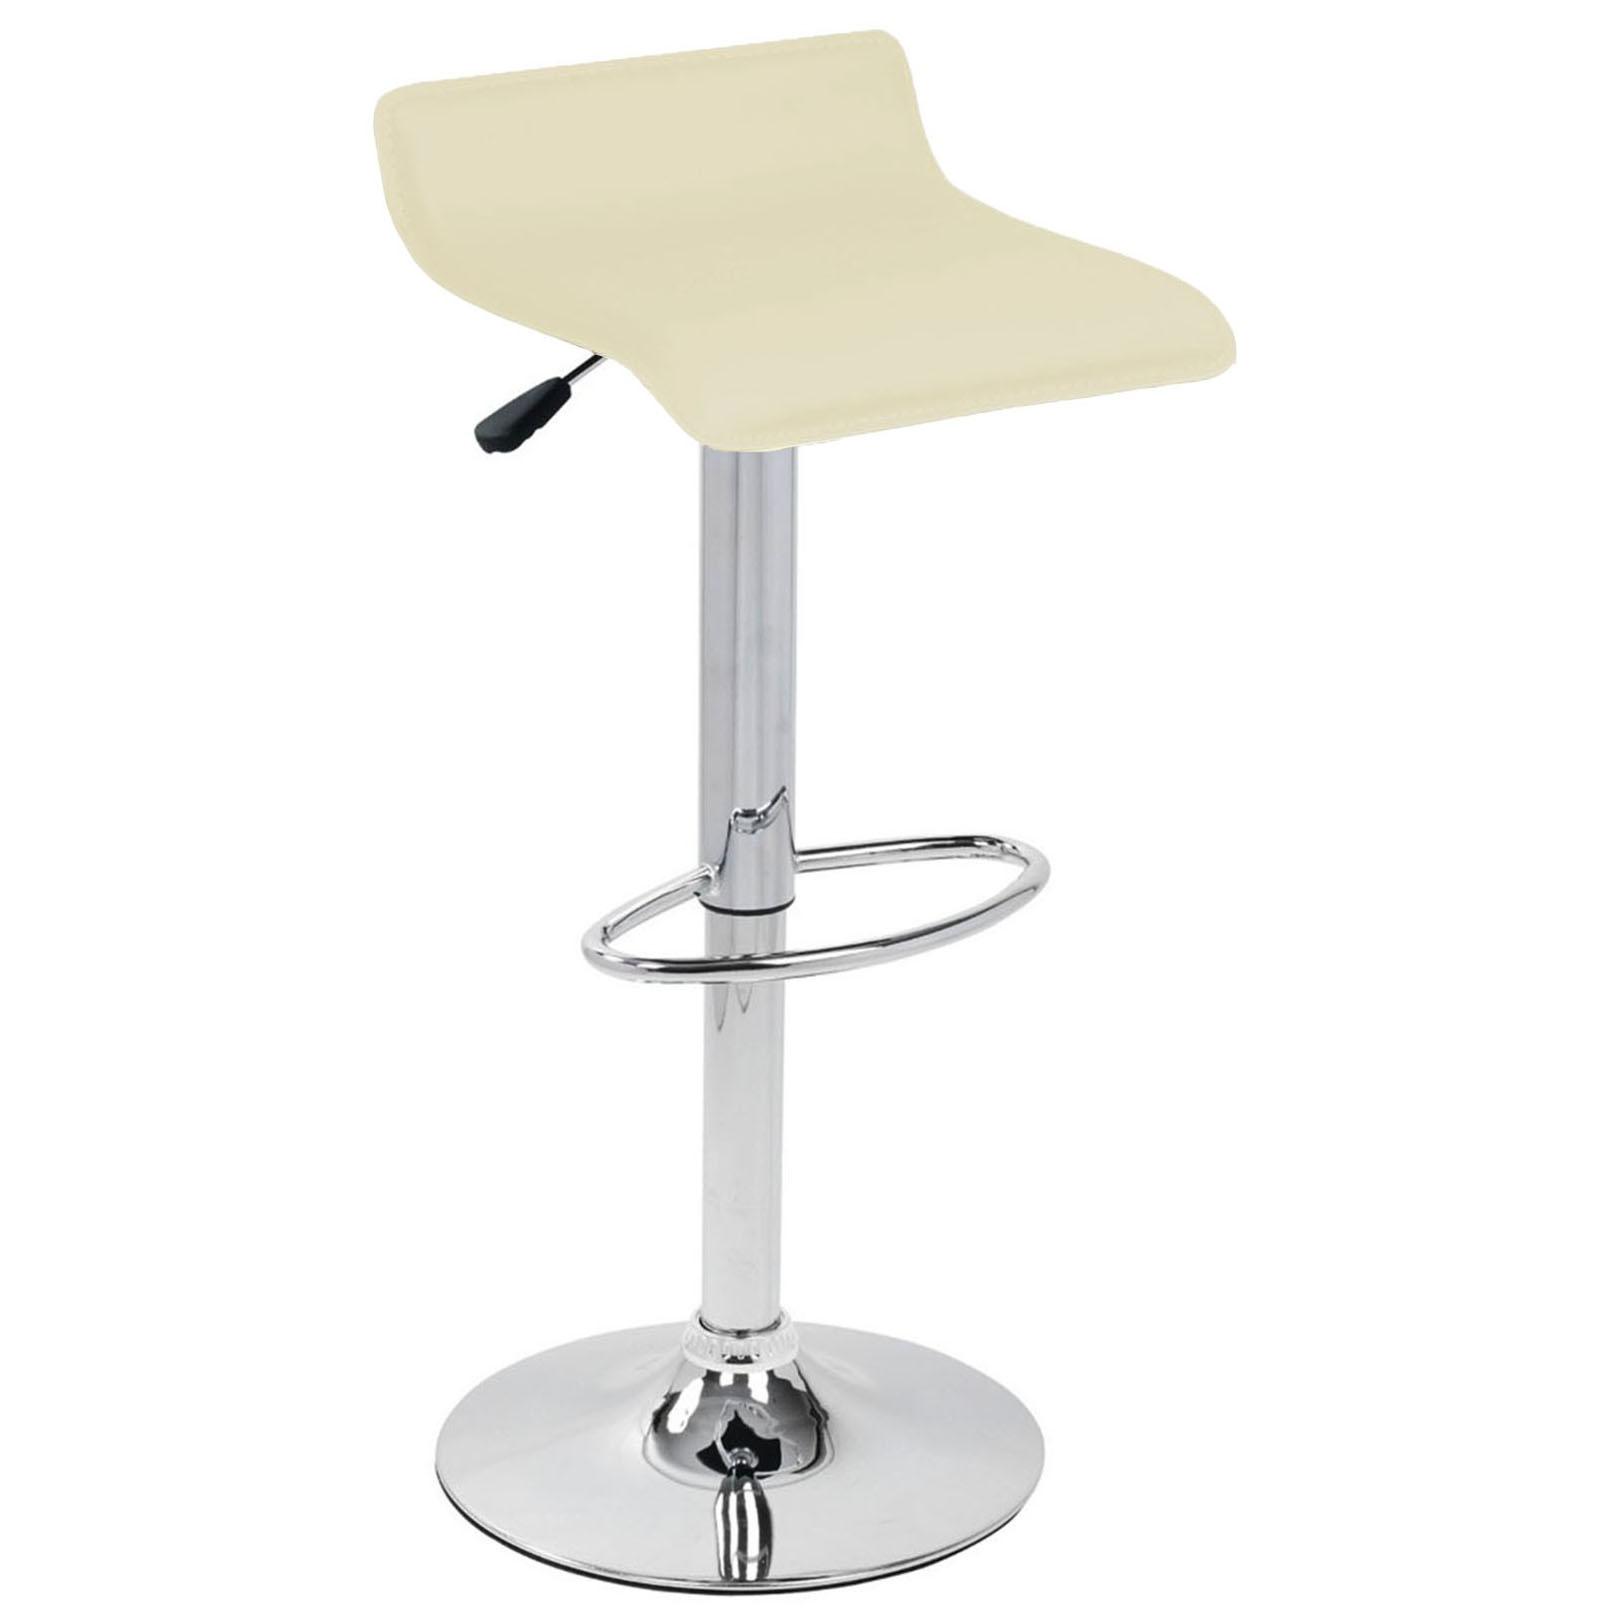 kitchen bar stool blue sink stools uk sale at trade prices barstools baceno cream